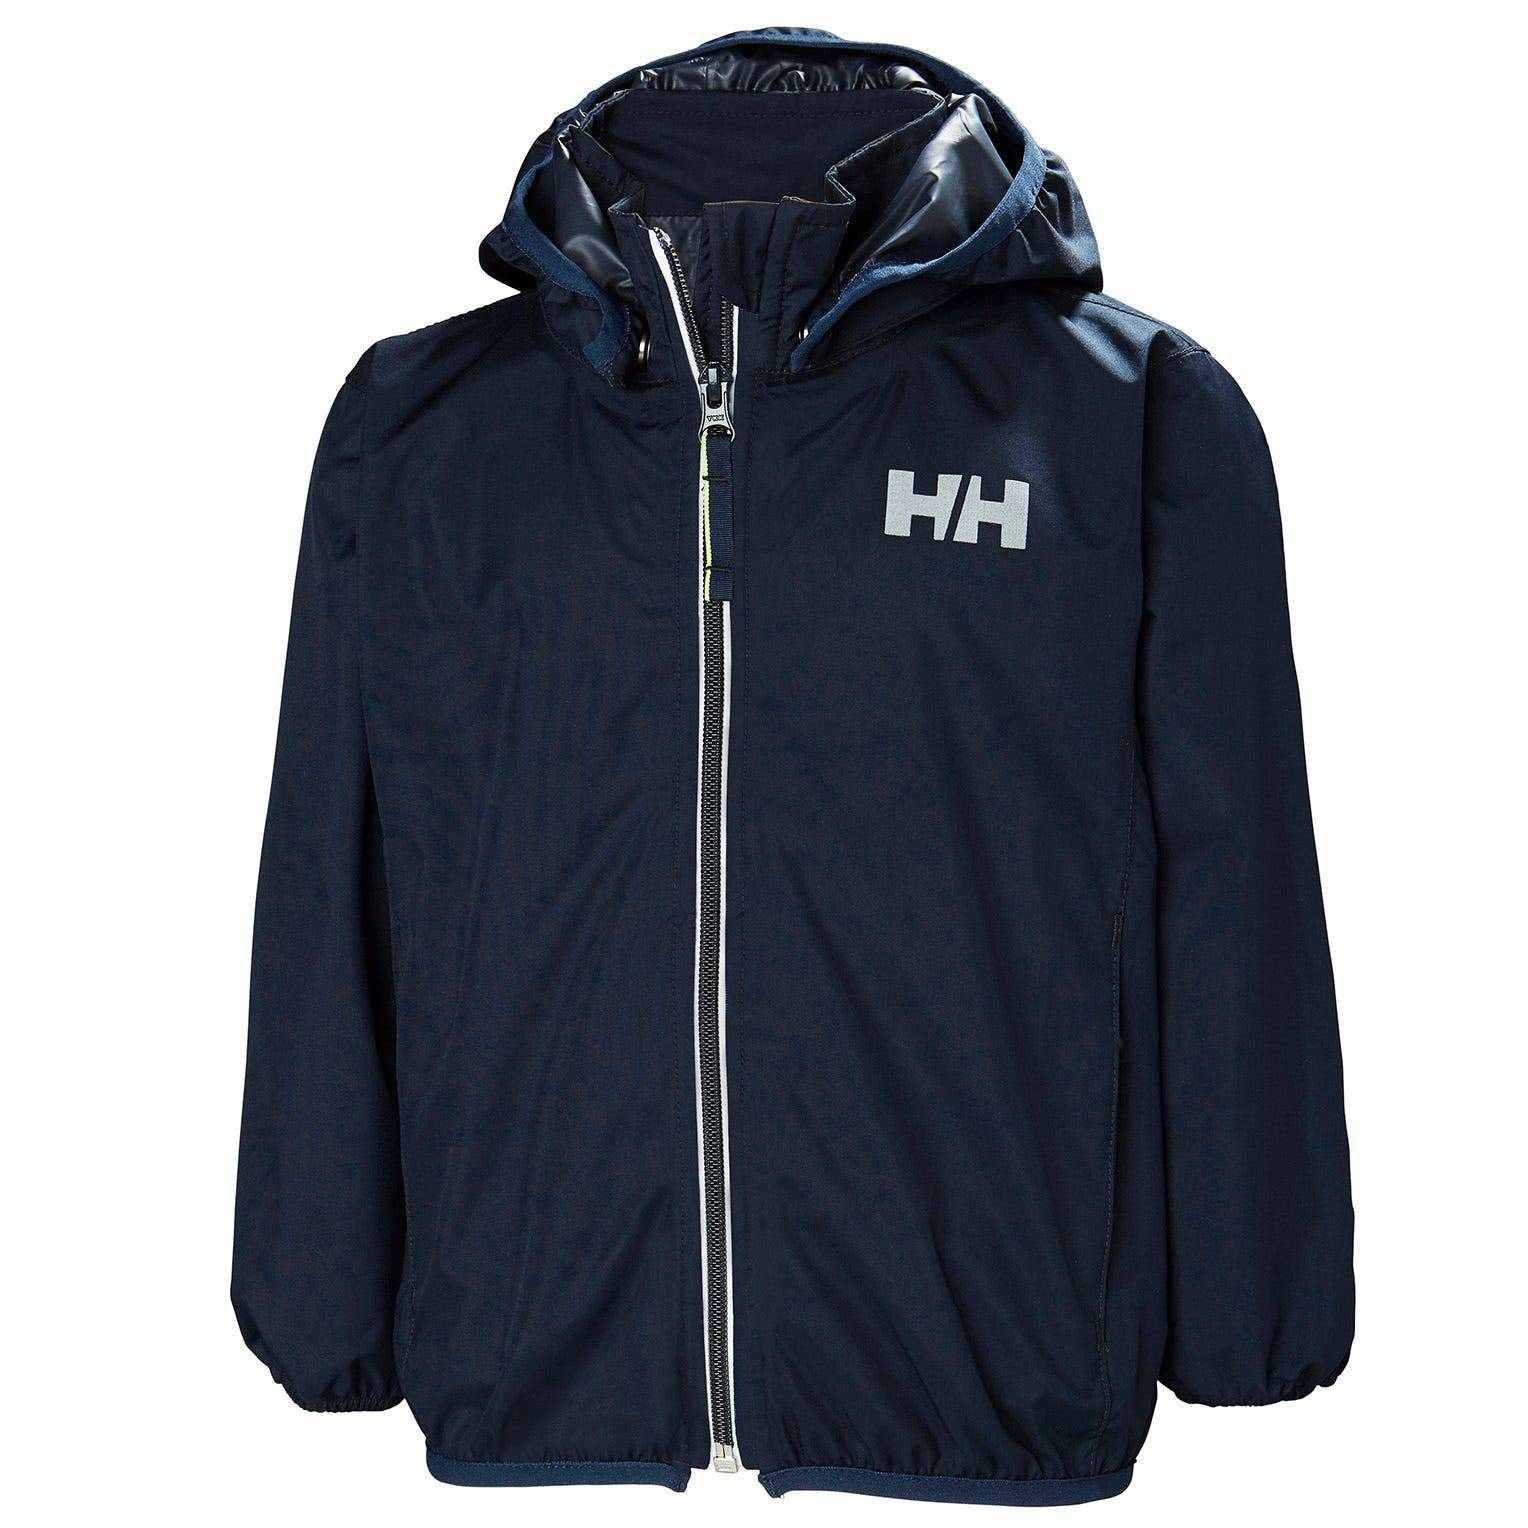 Helly Hansen Kids Helium Packable Jacket Parka Navy 116/6